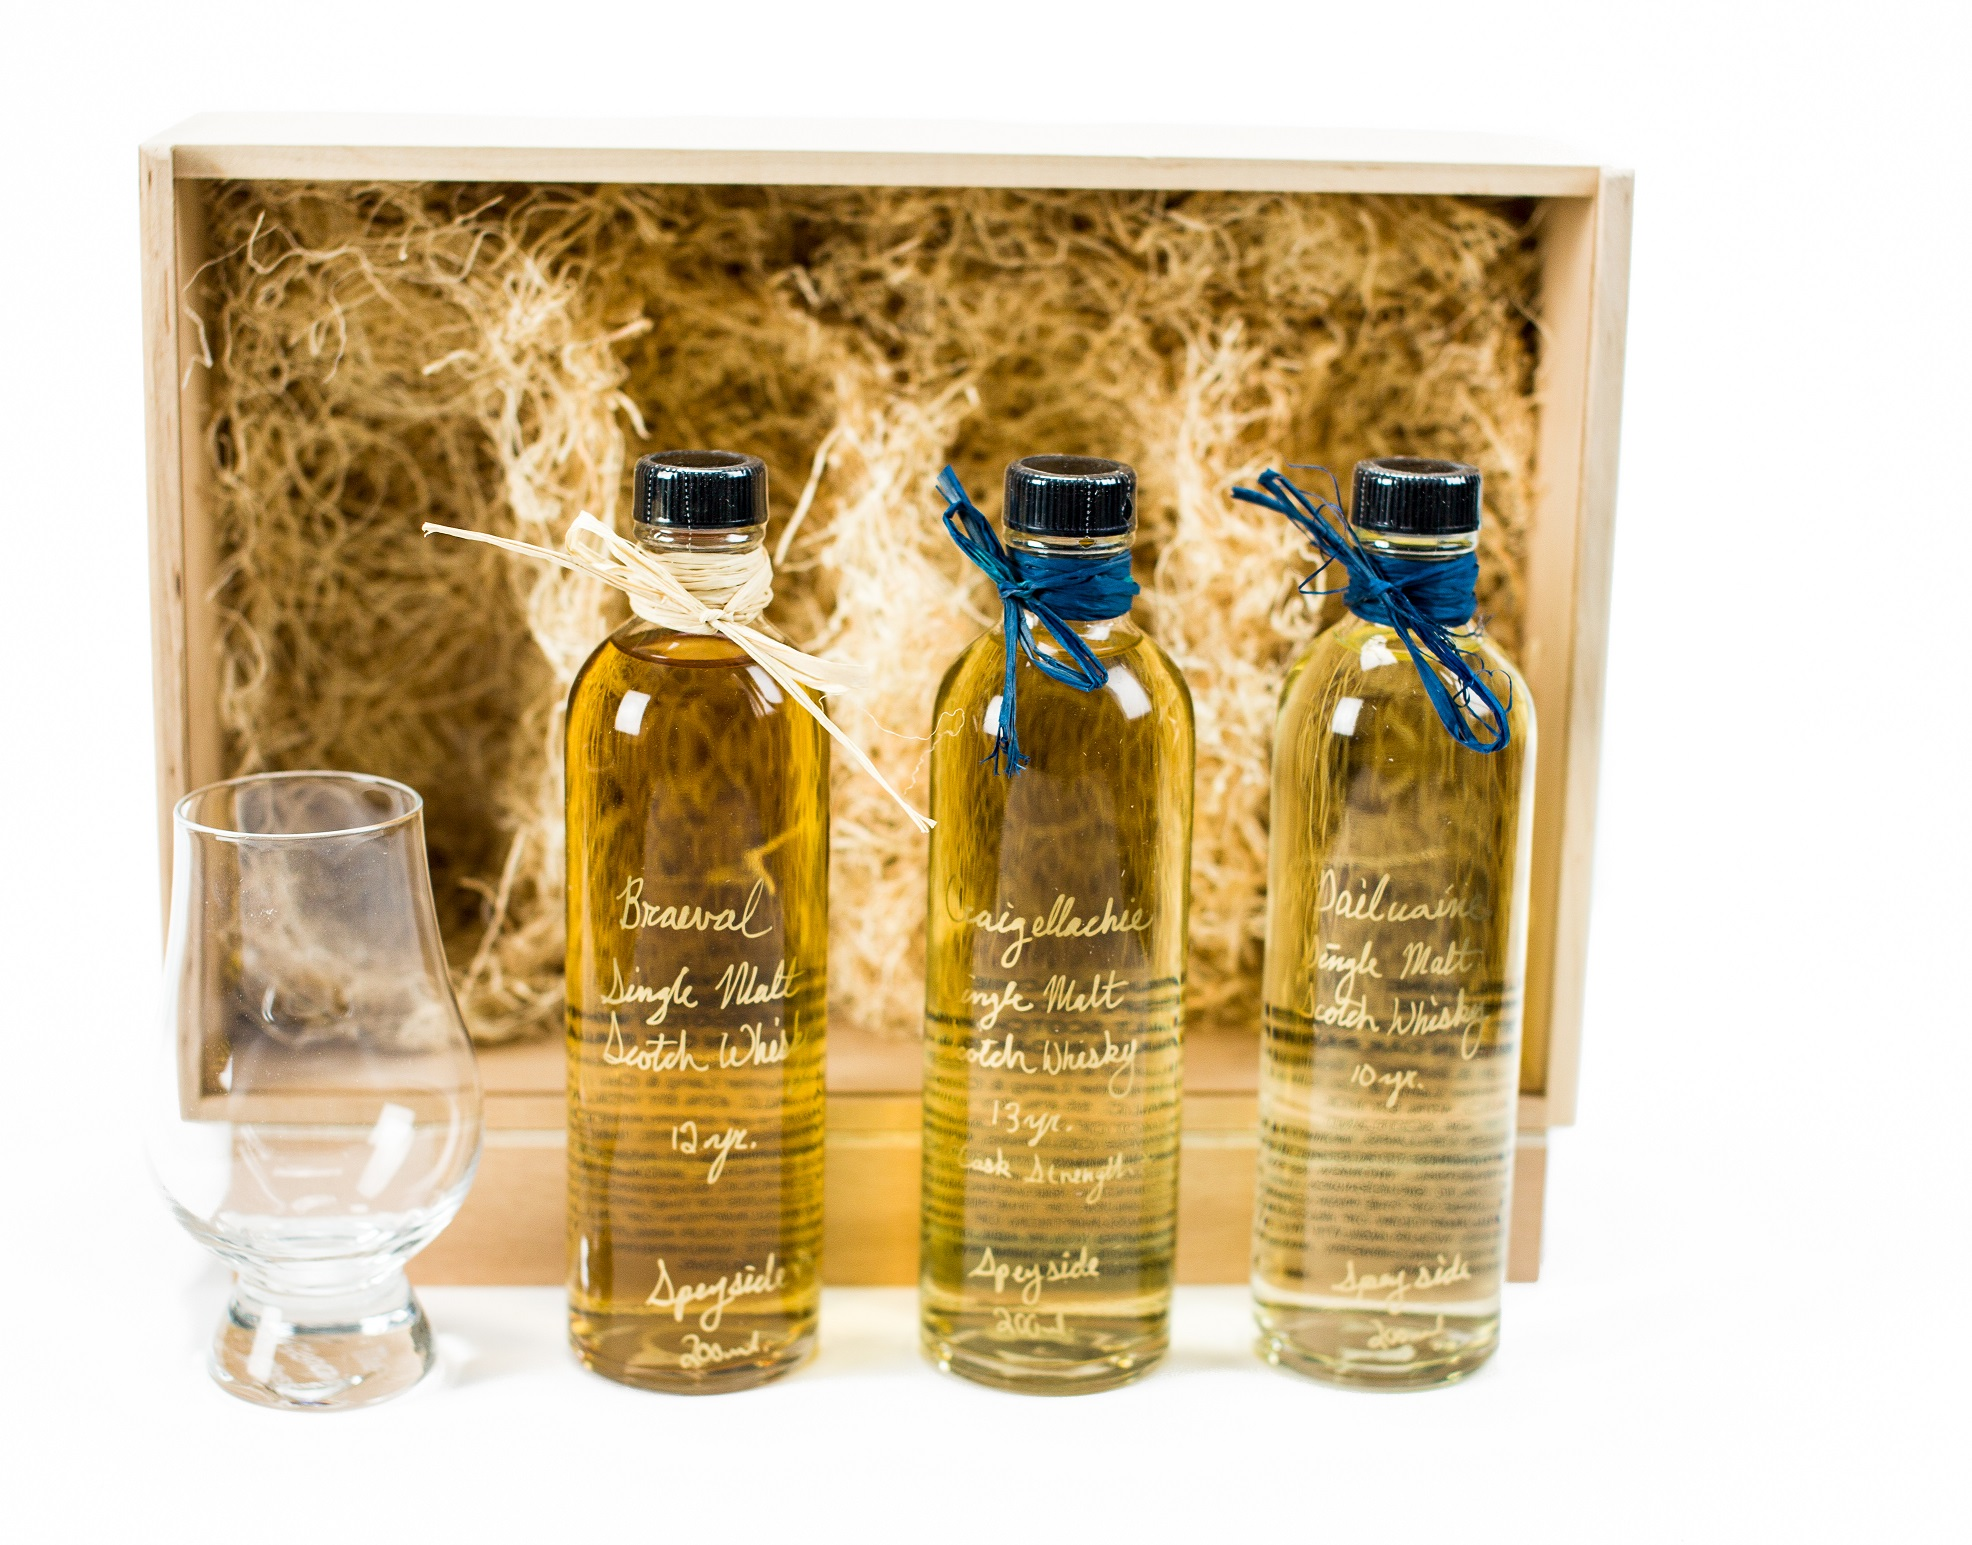 vomFASS Speyside Scotch